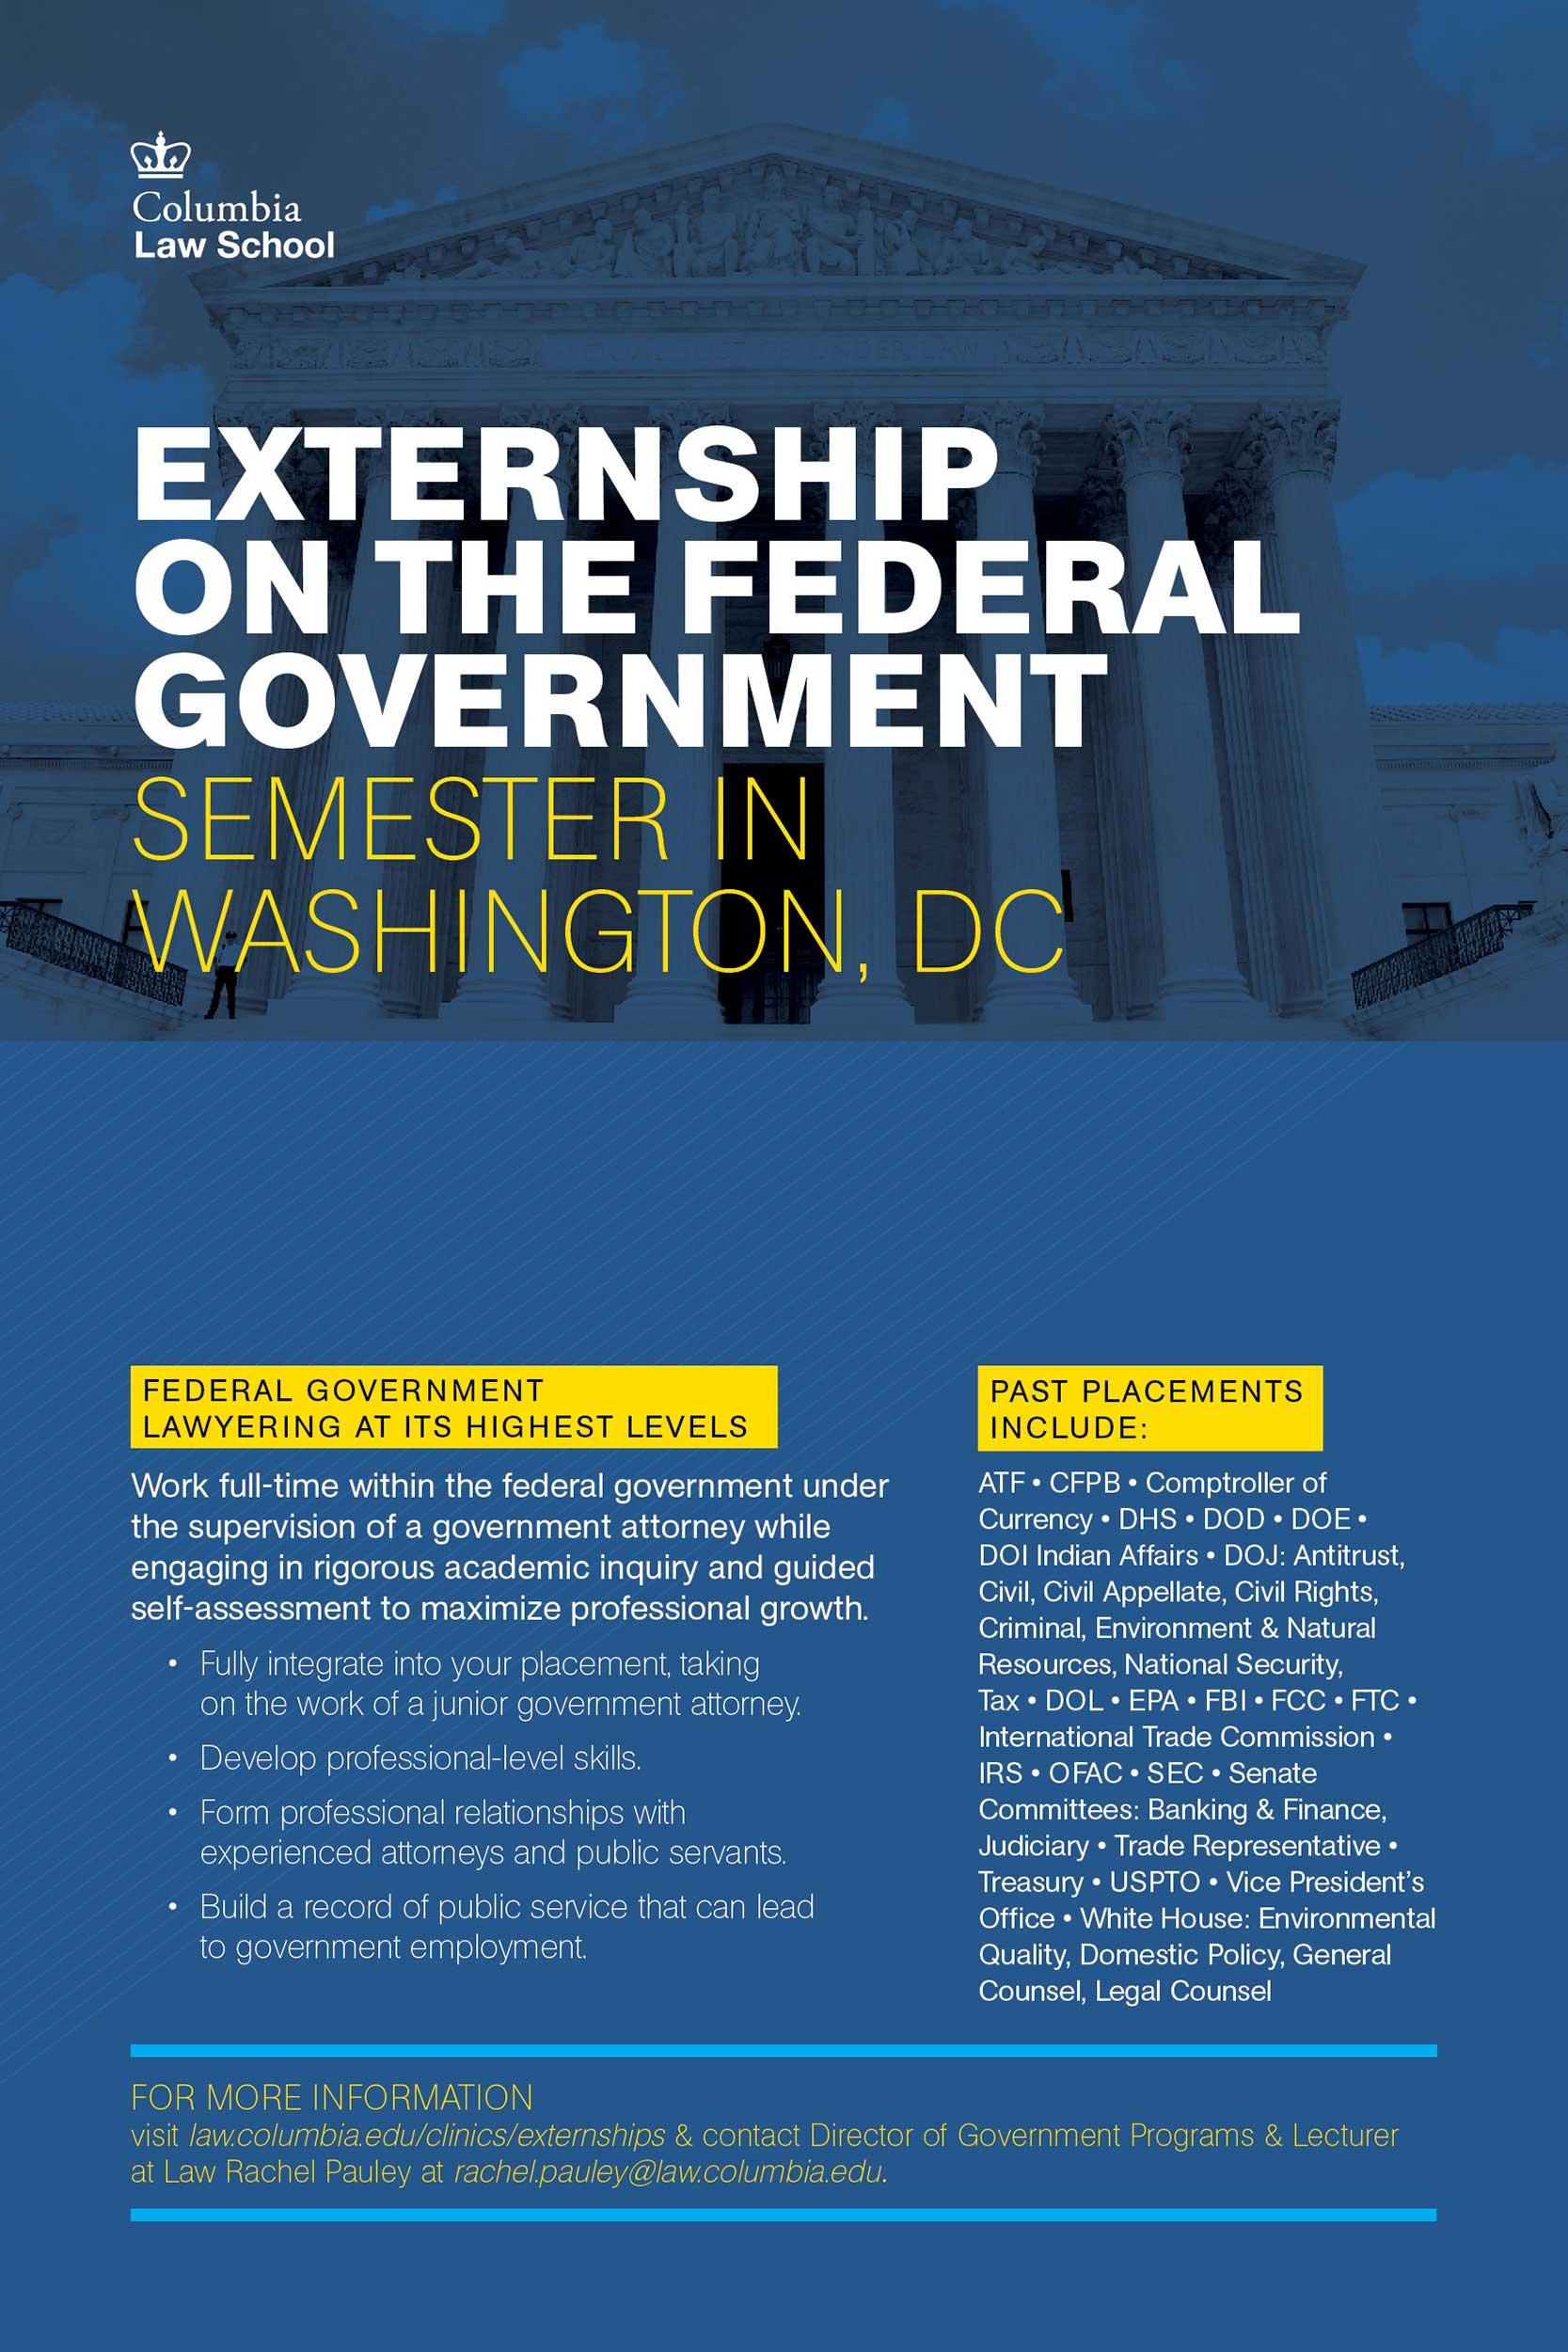 Externship-Fed-Govt-Poster-4Web.jpg